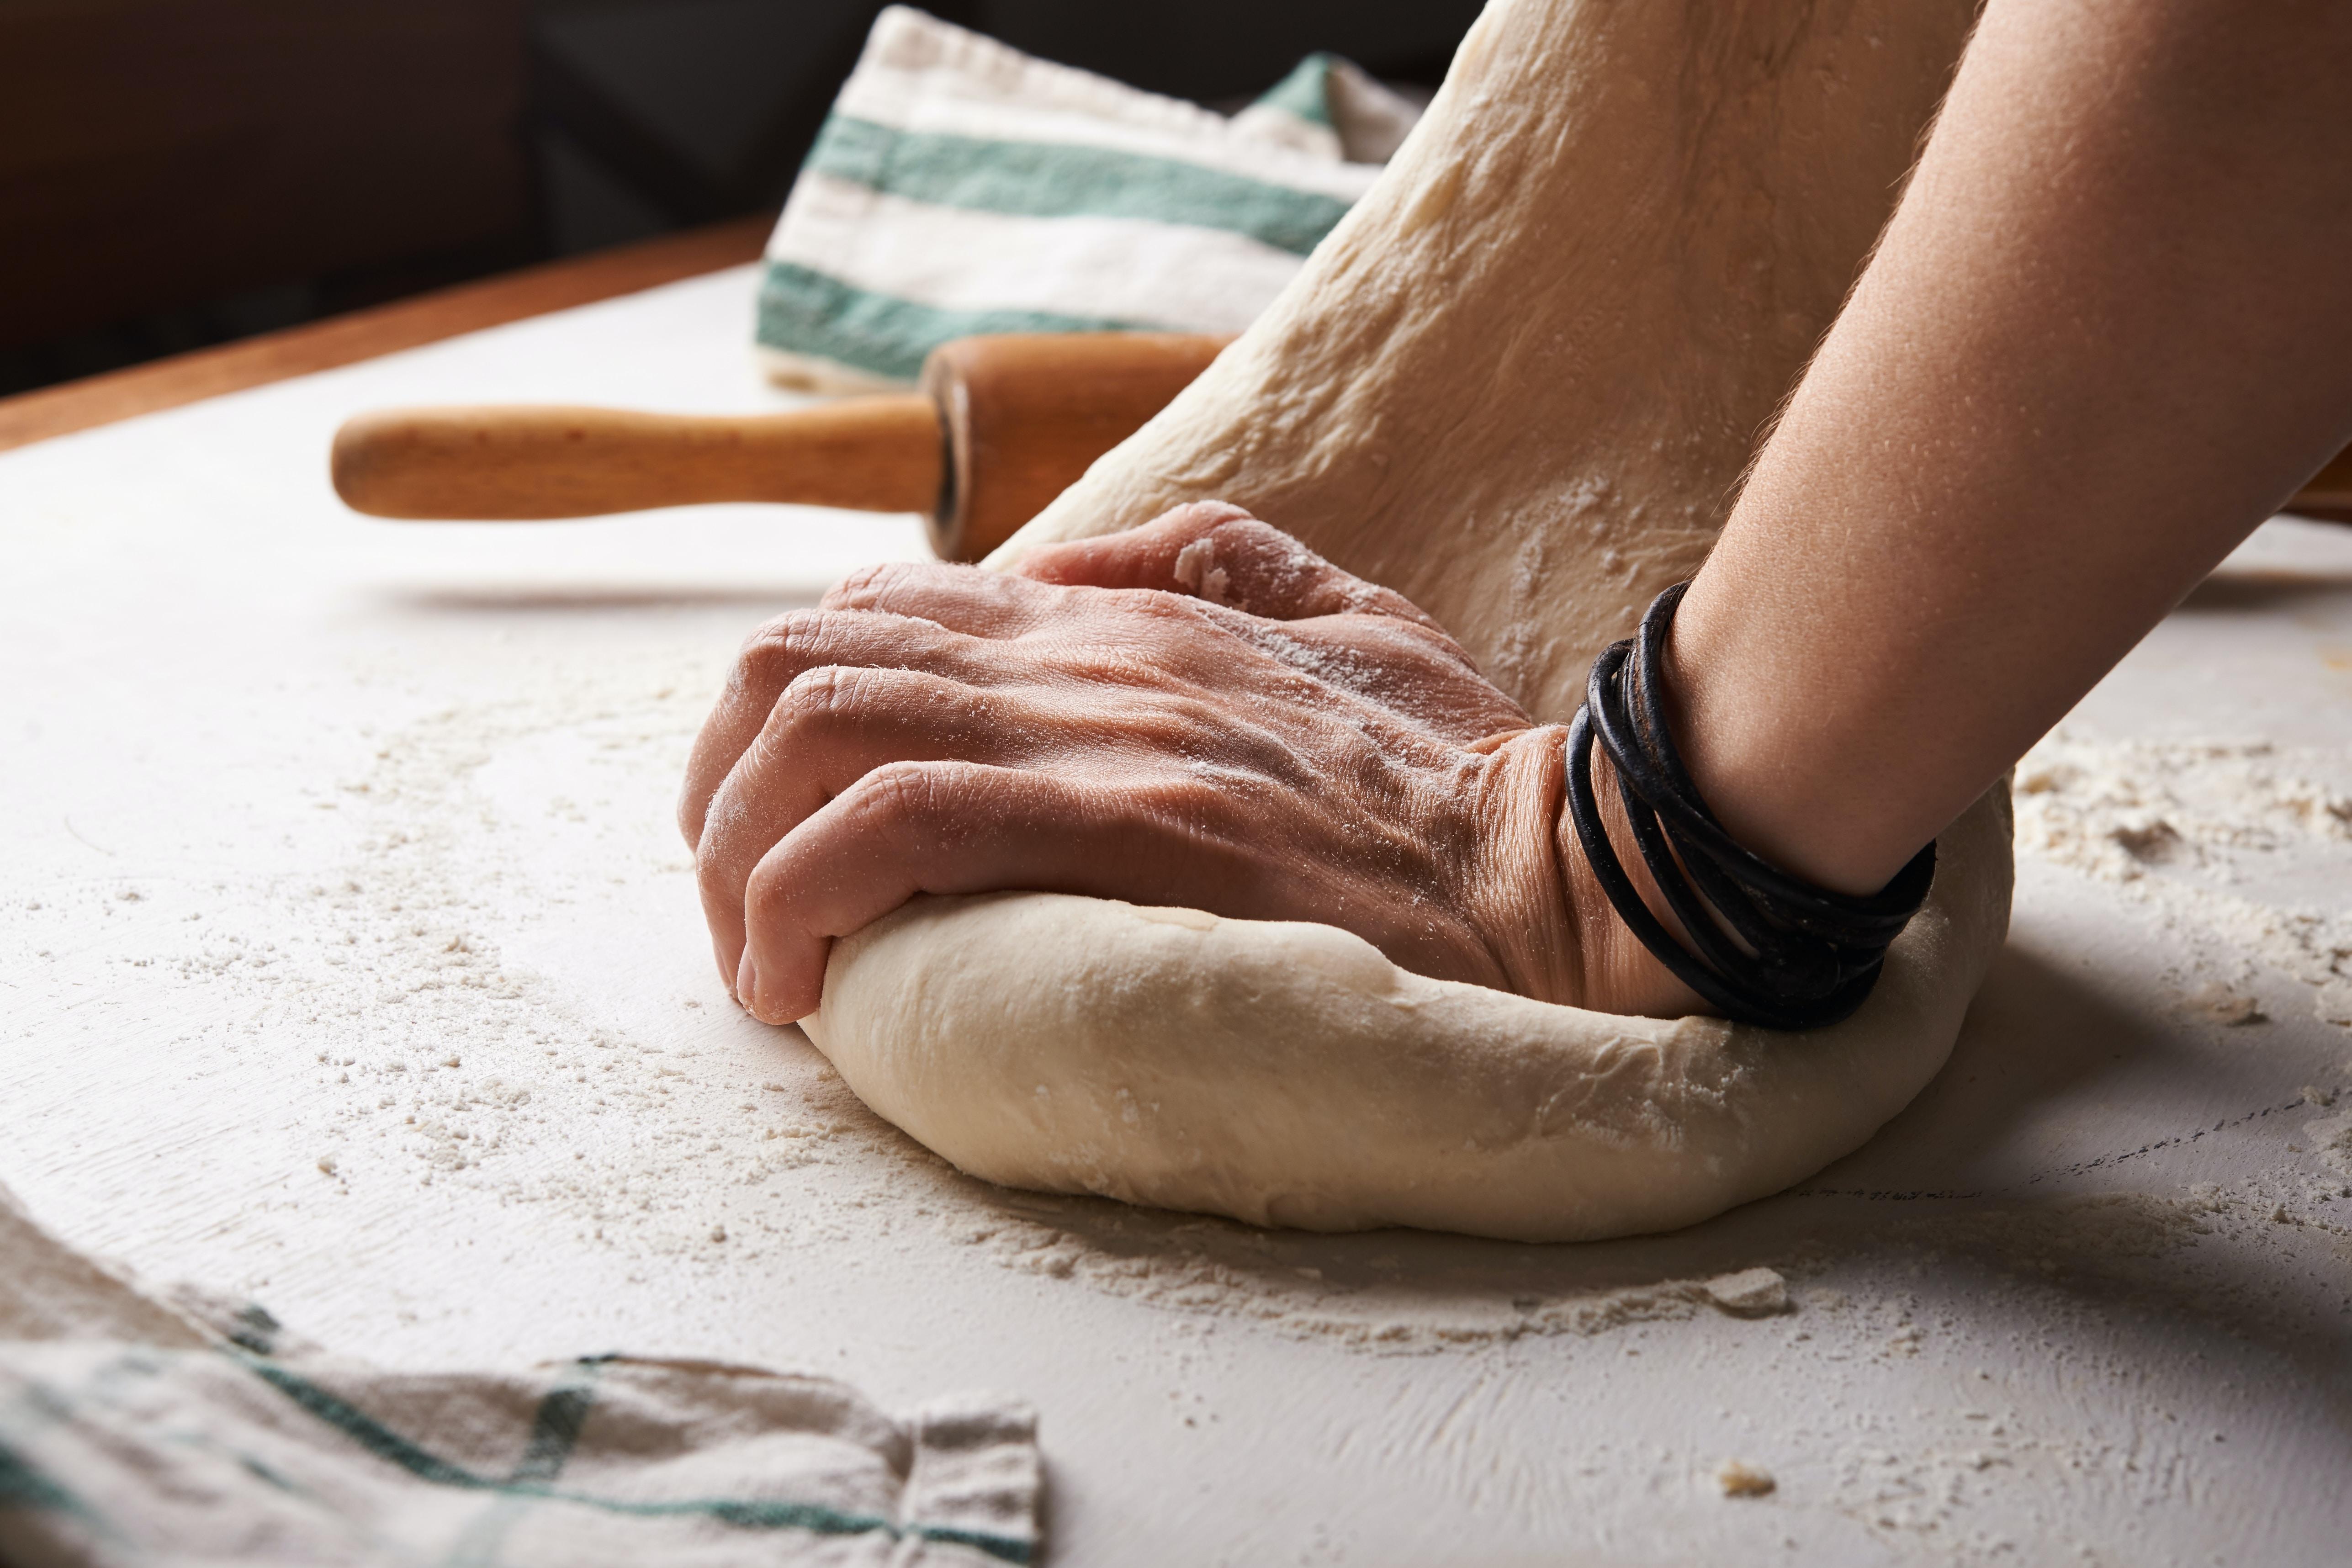 10 Things Every Budding Baker Needs